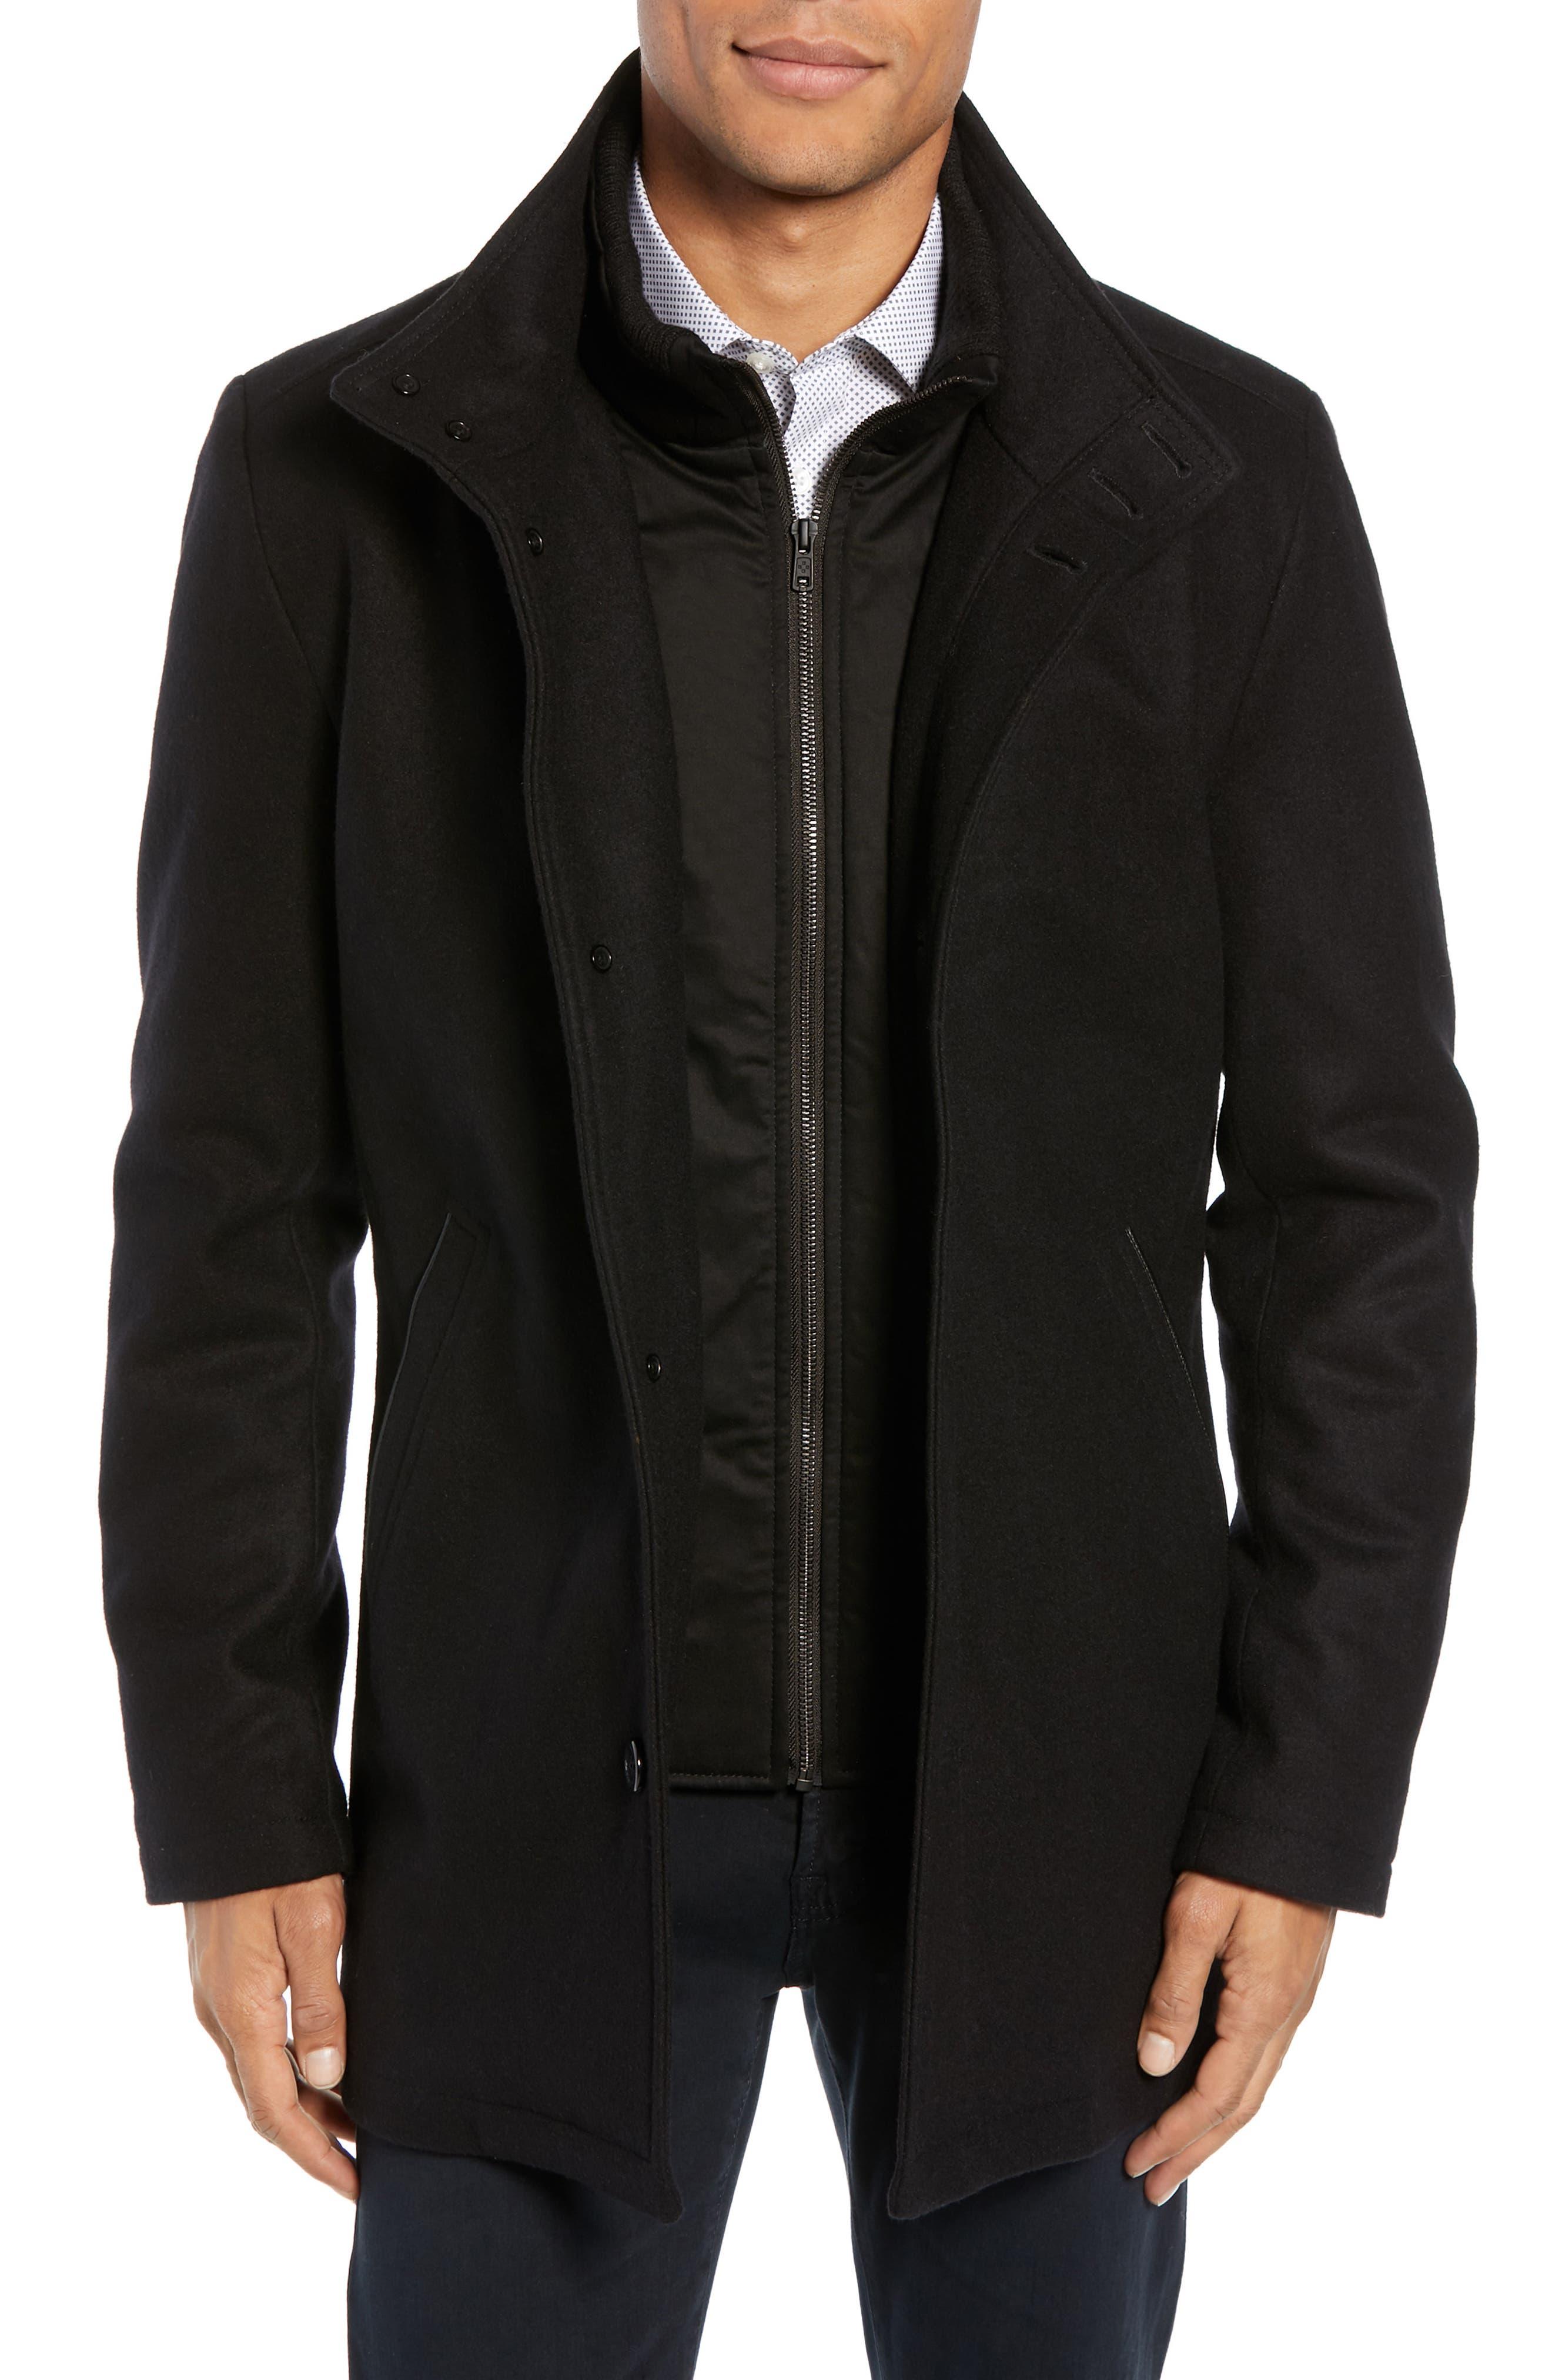 Classic Wool Blend Car Coat with Inset Bib,                         Main,                         color, BLACK